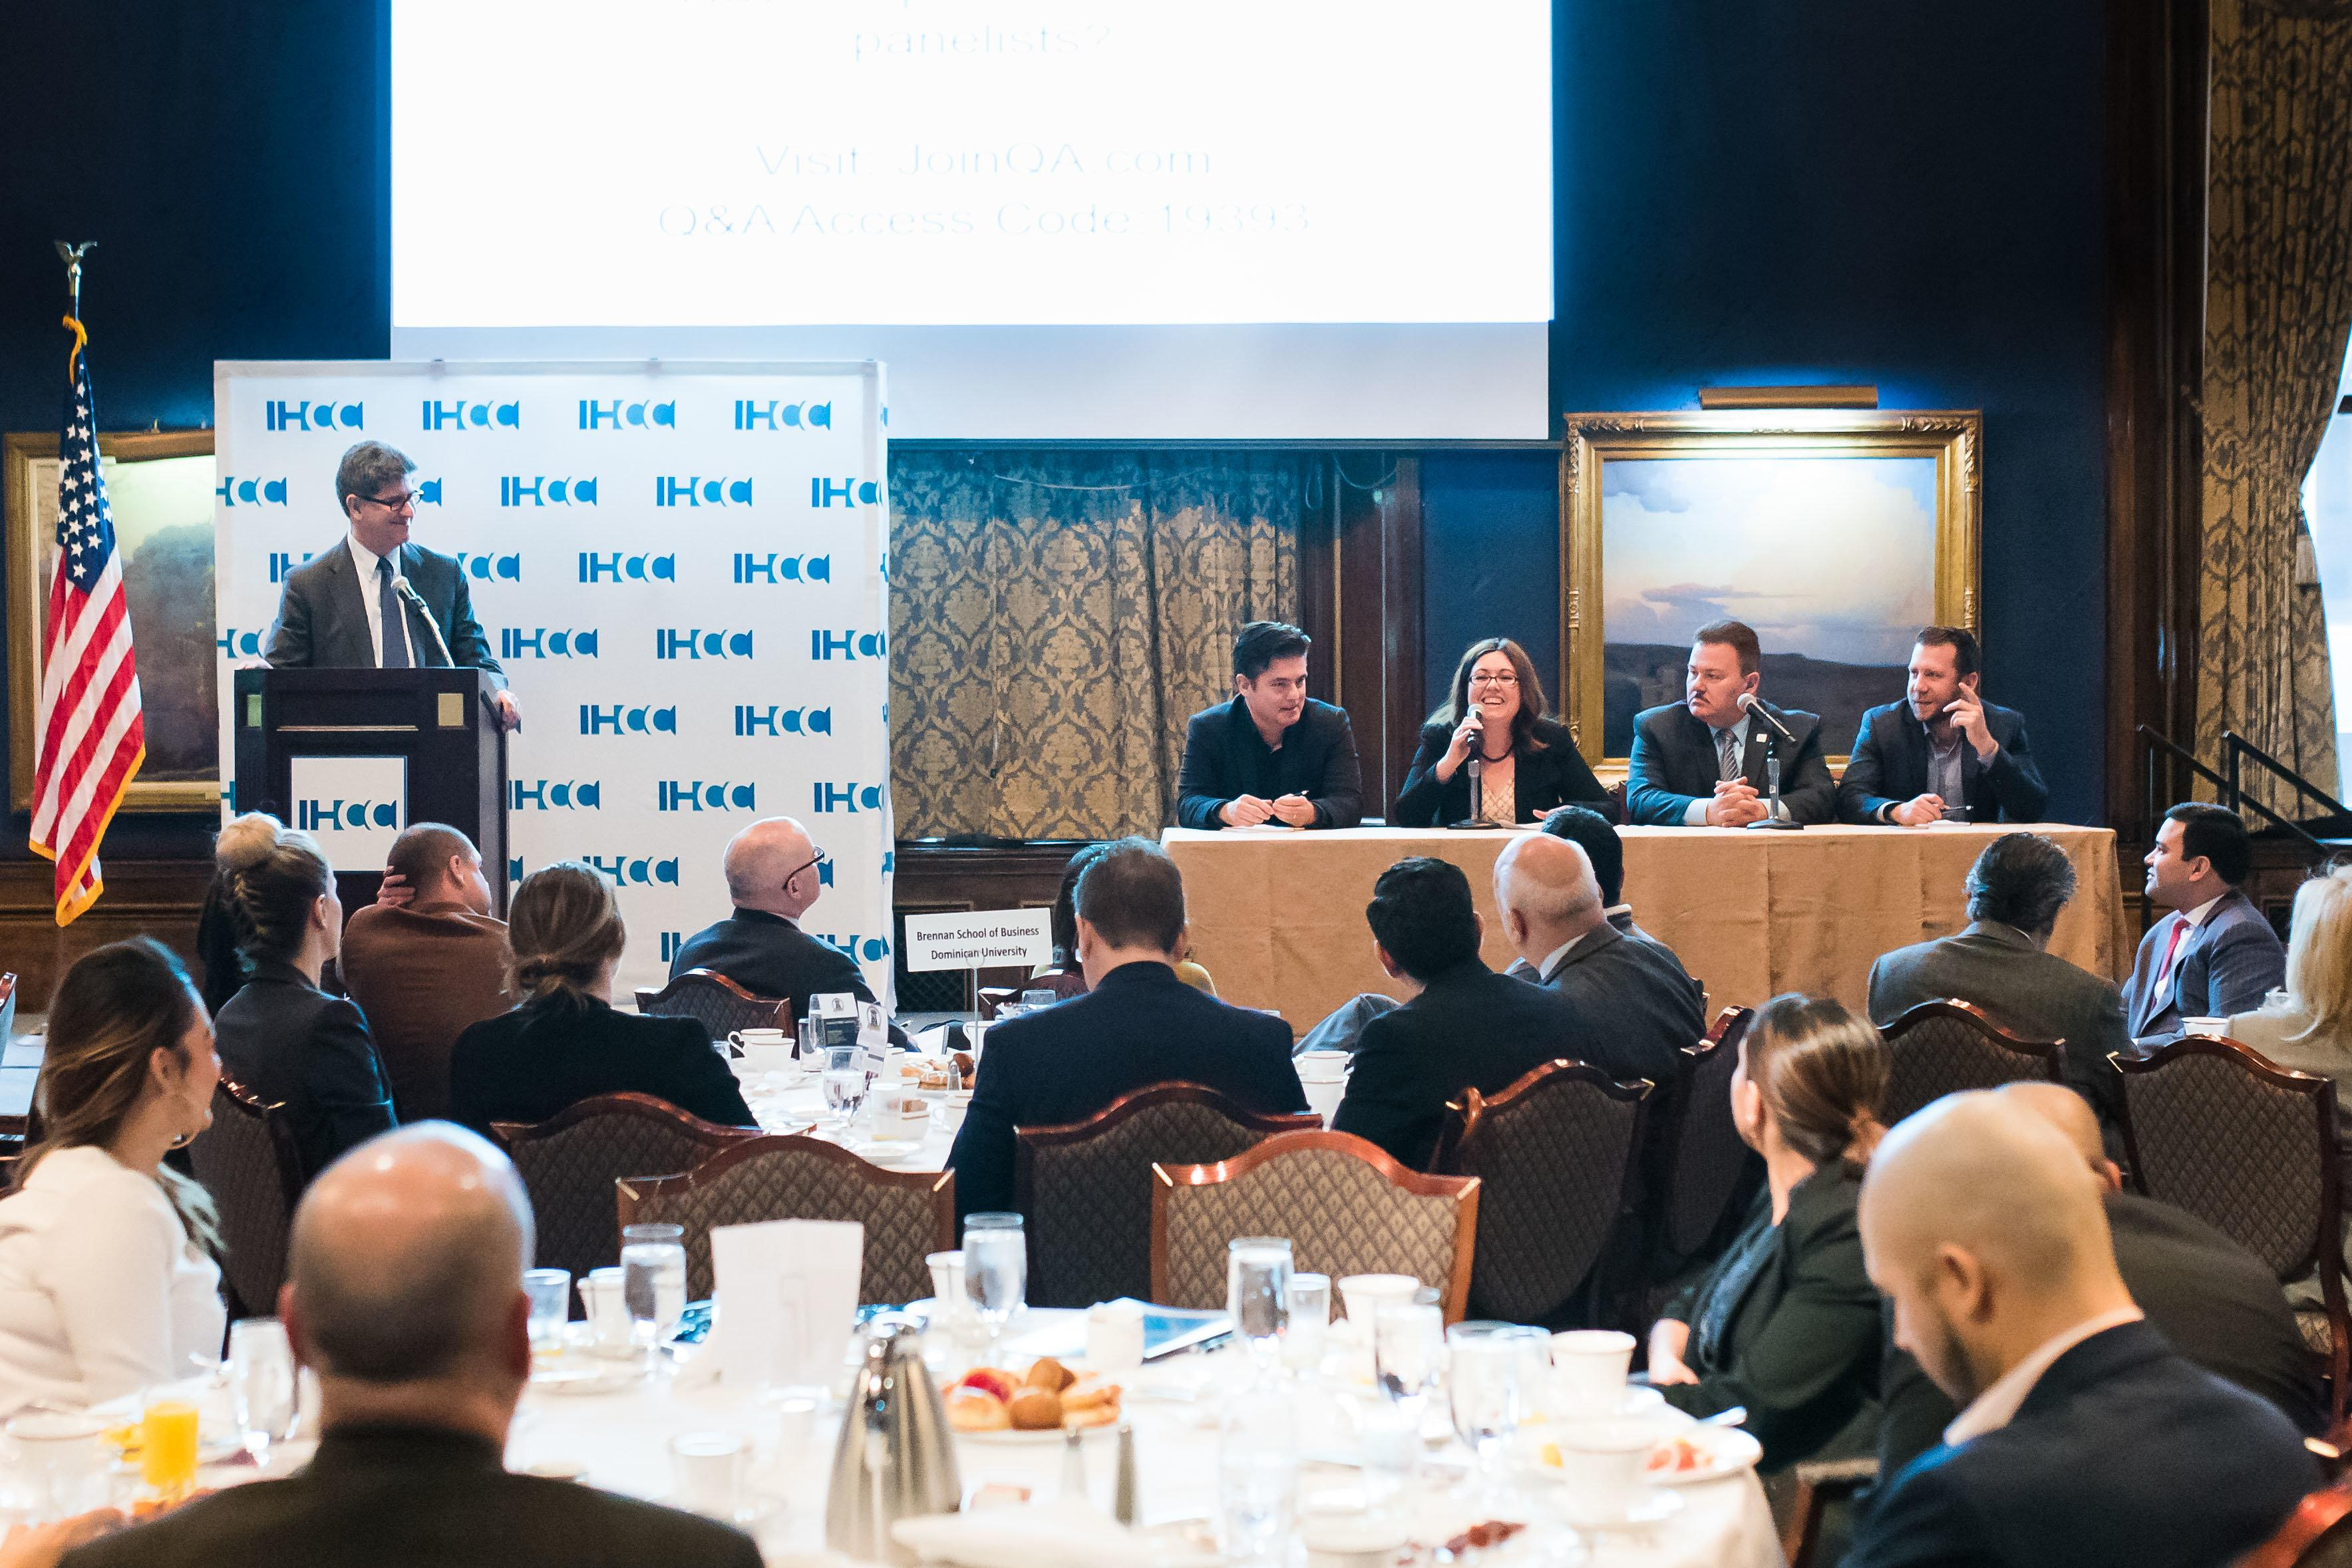 IHCC Procurement Panel & Matchmaking at the F